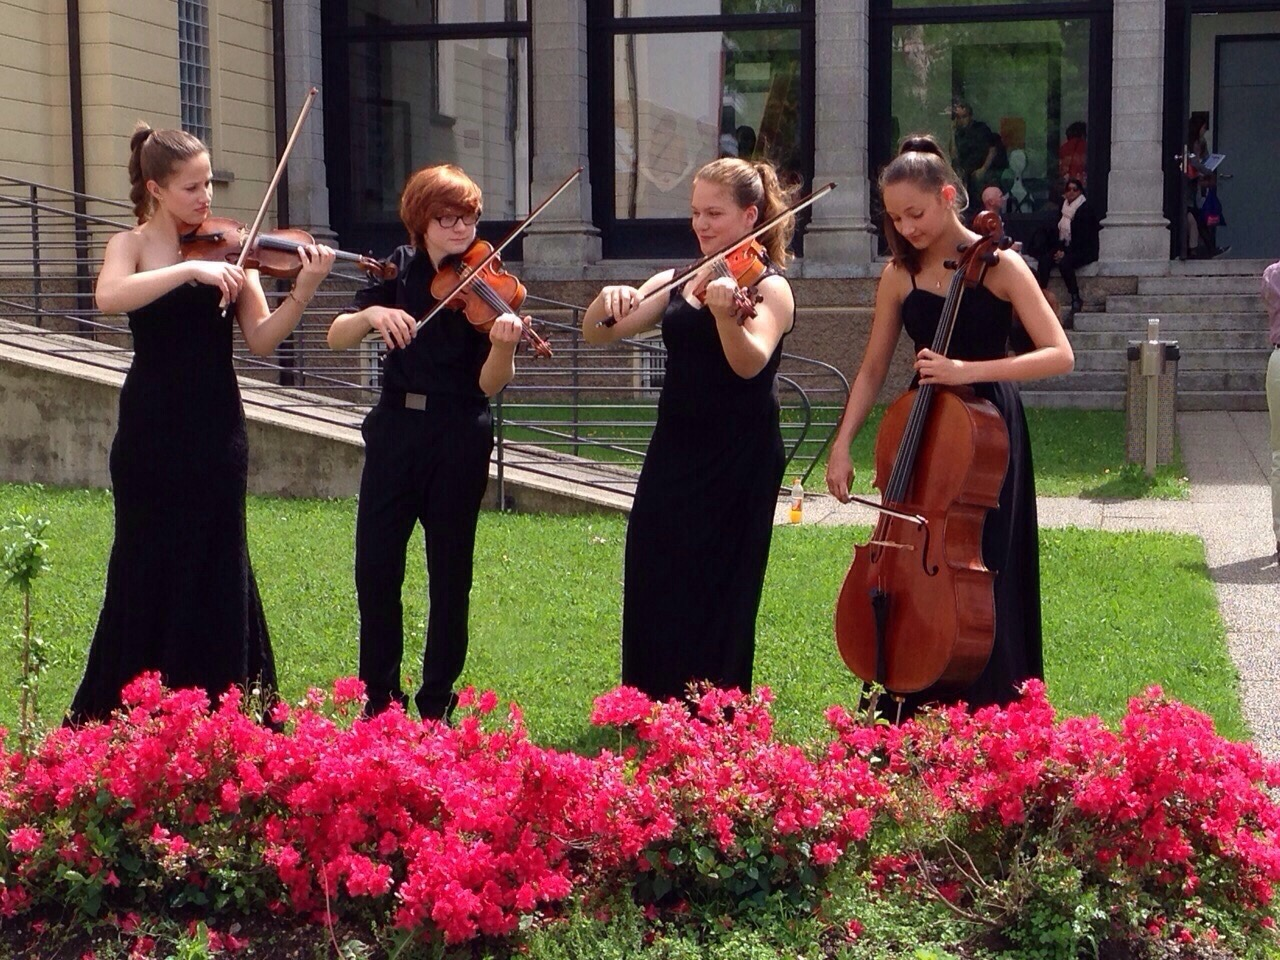 DAAS Quartet - Ariana Puhar, Silvan Dezini, Daphné Faist, Alina Morger